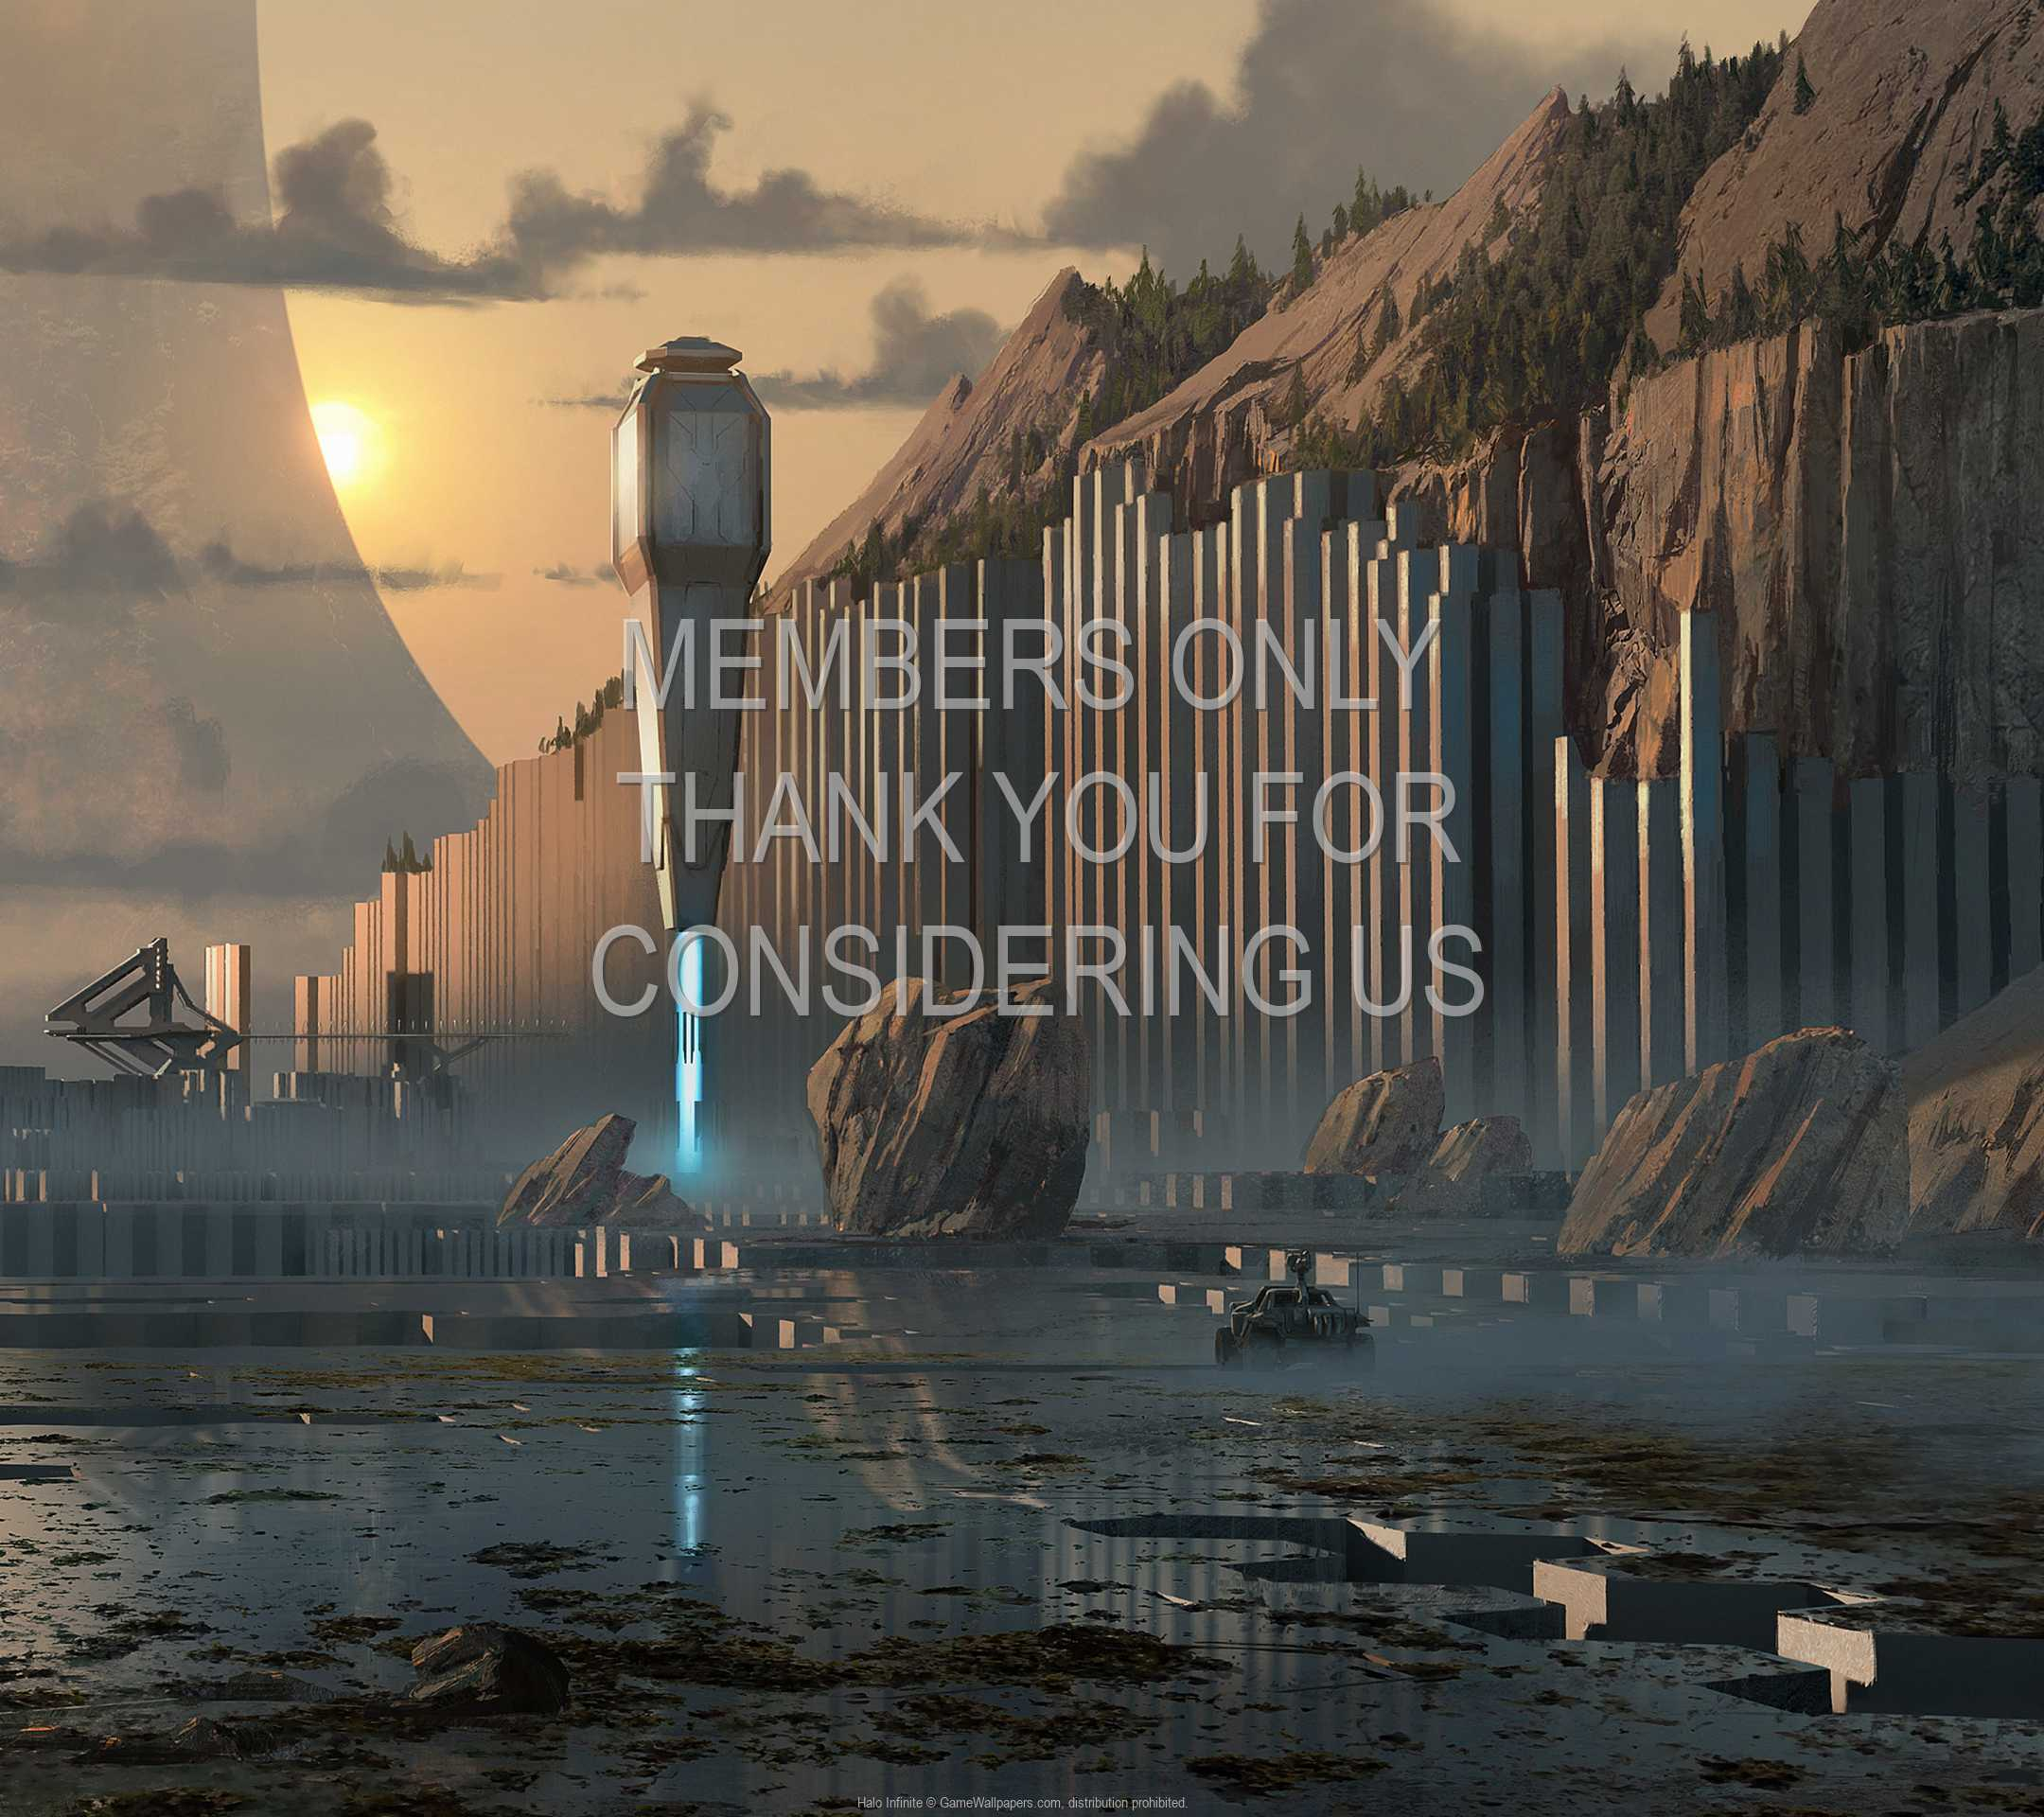 Halo: Infinite 1080p Horizontal Mobile wallpaper or background 07